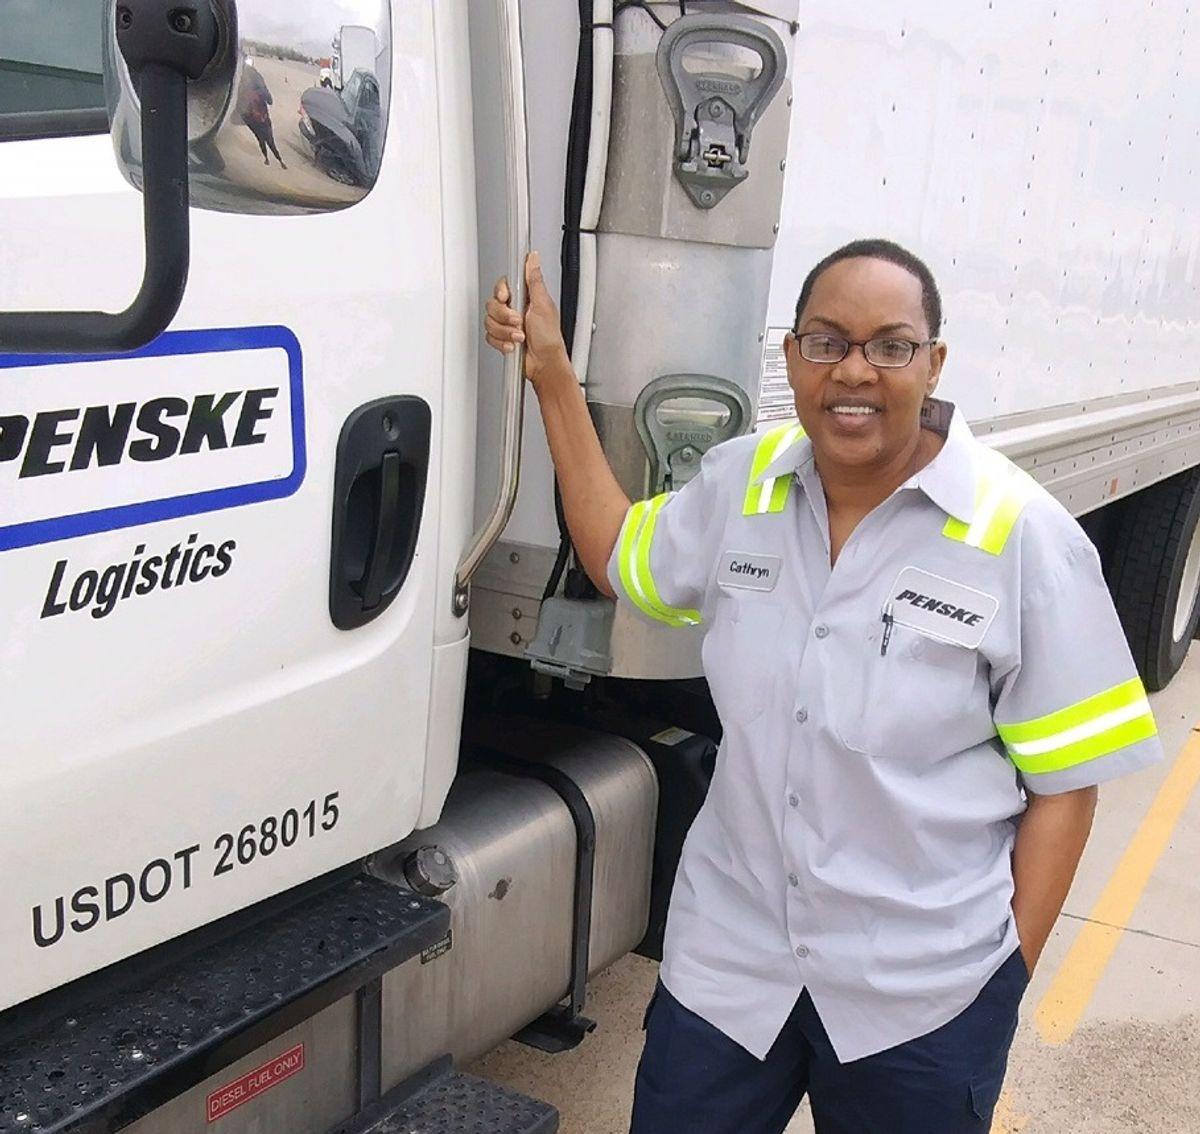 Penske Professional Truck Driver Charts Path to Rewarding Career